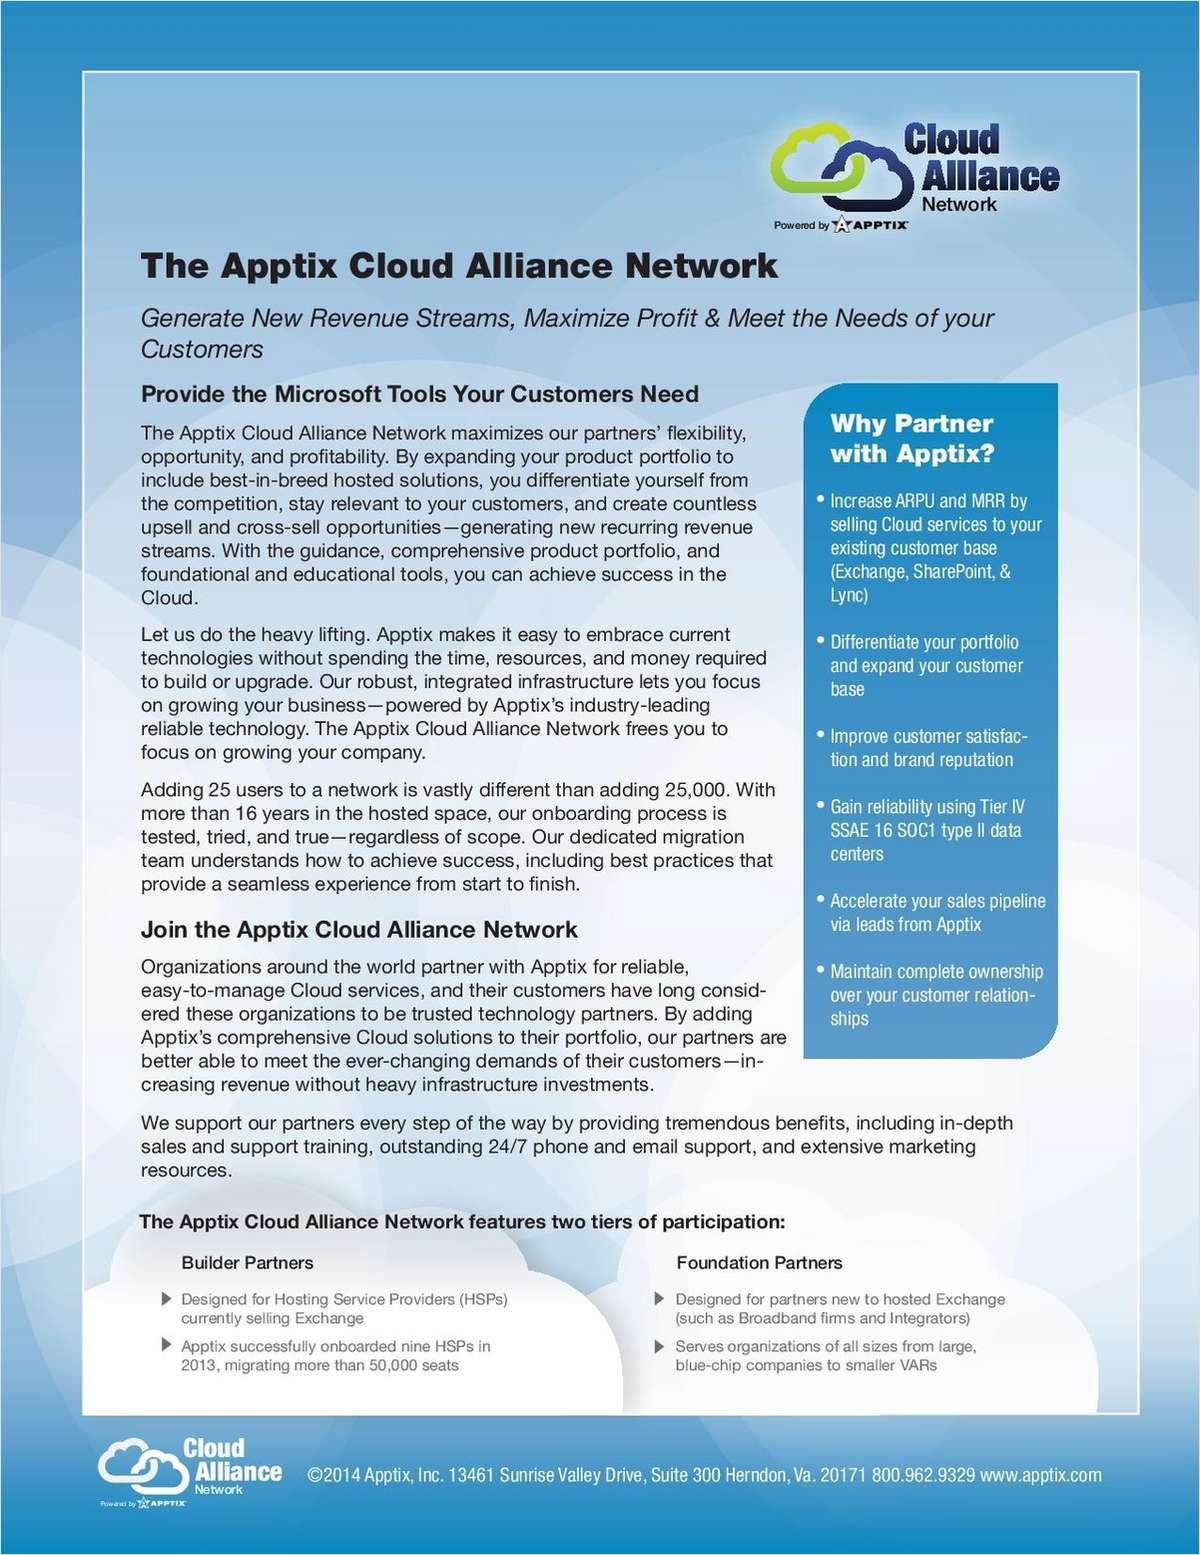 The Apptix Cloud Alliance Network